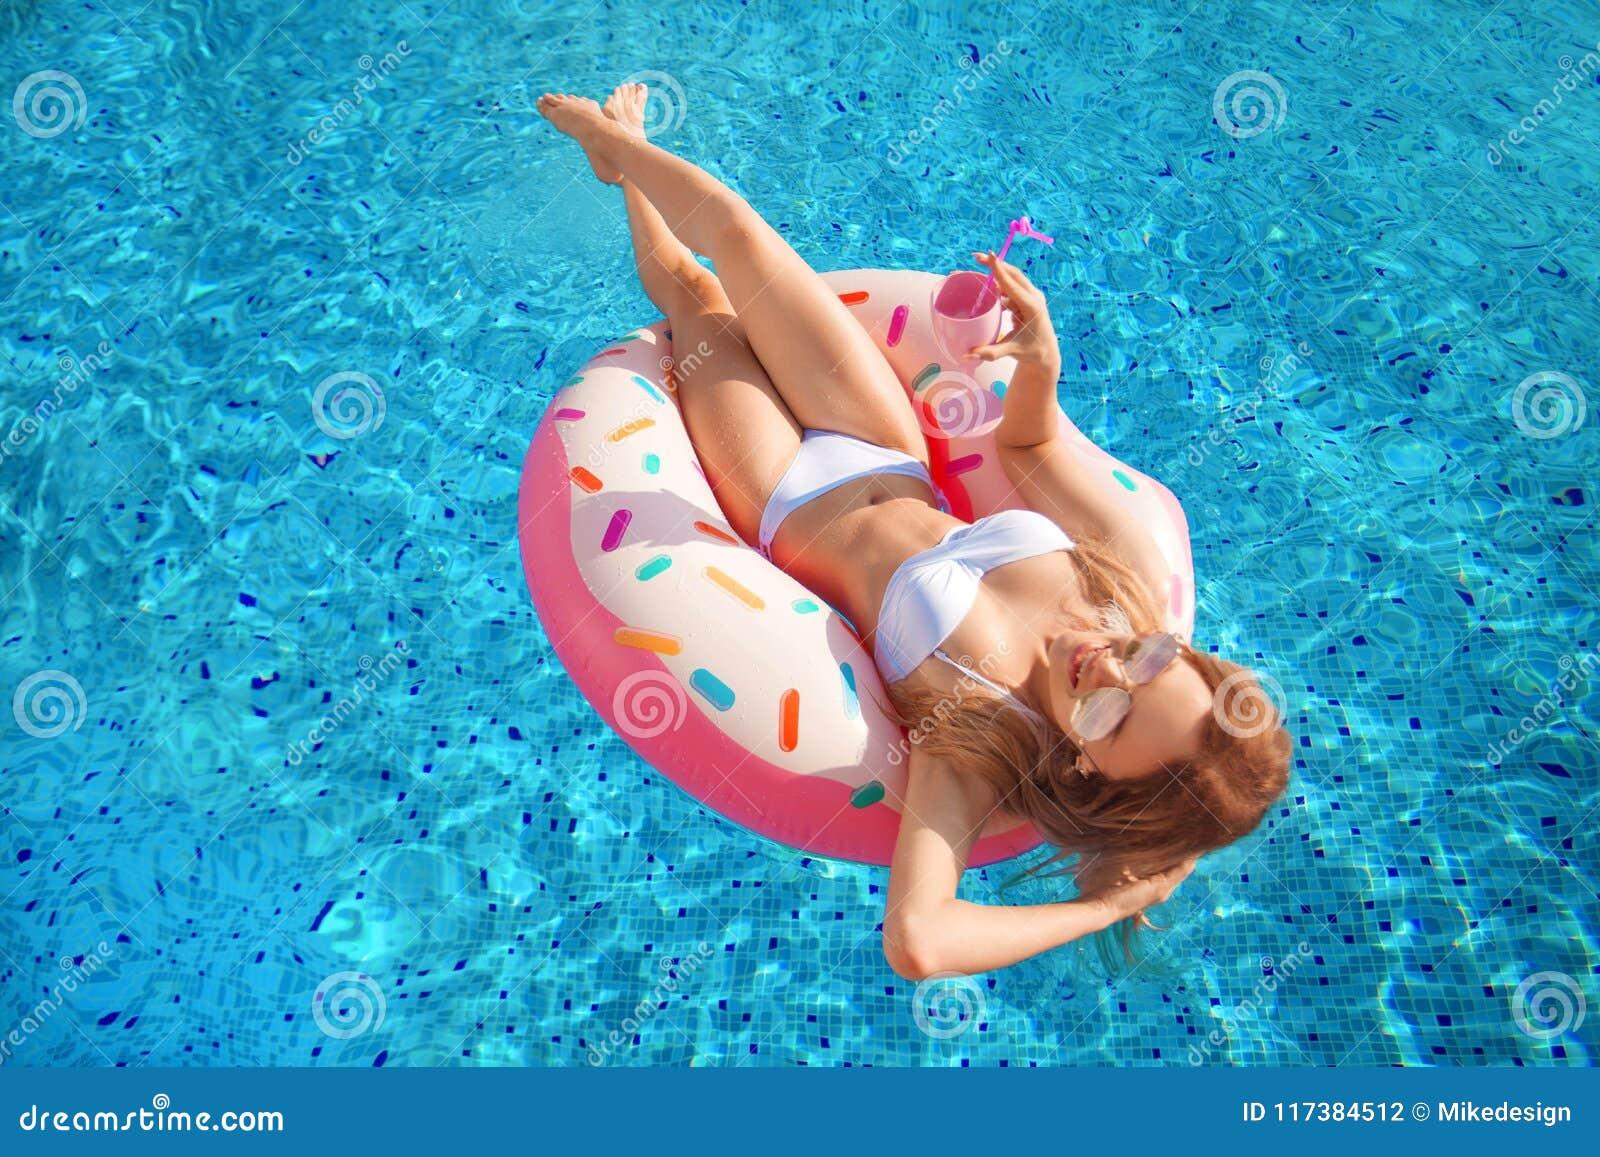 Krasnodar Gegend, Katya Frau im Bikini auf der aufblasbaren Donutmatratze im BADEKURORT-Swimmingpool Reise zum Seerest